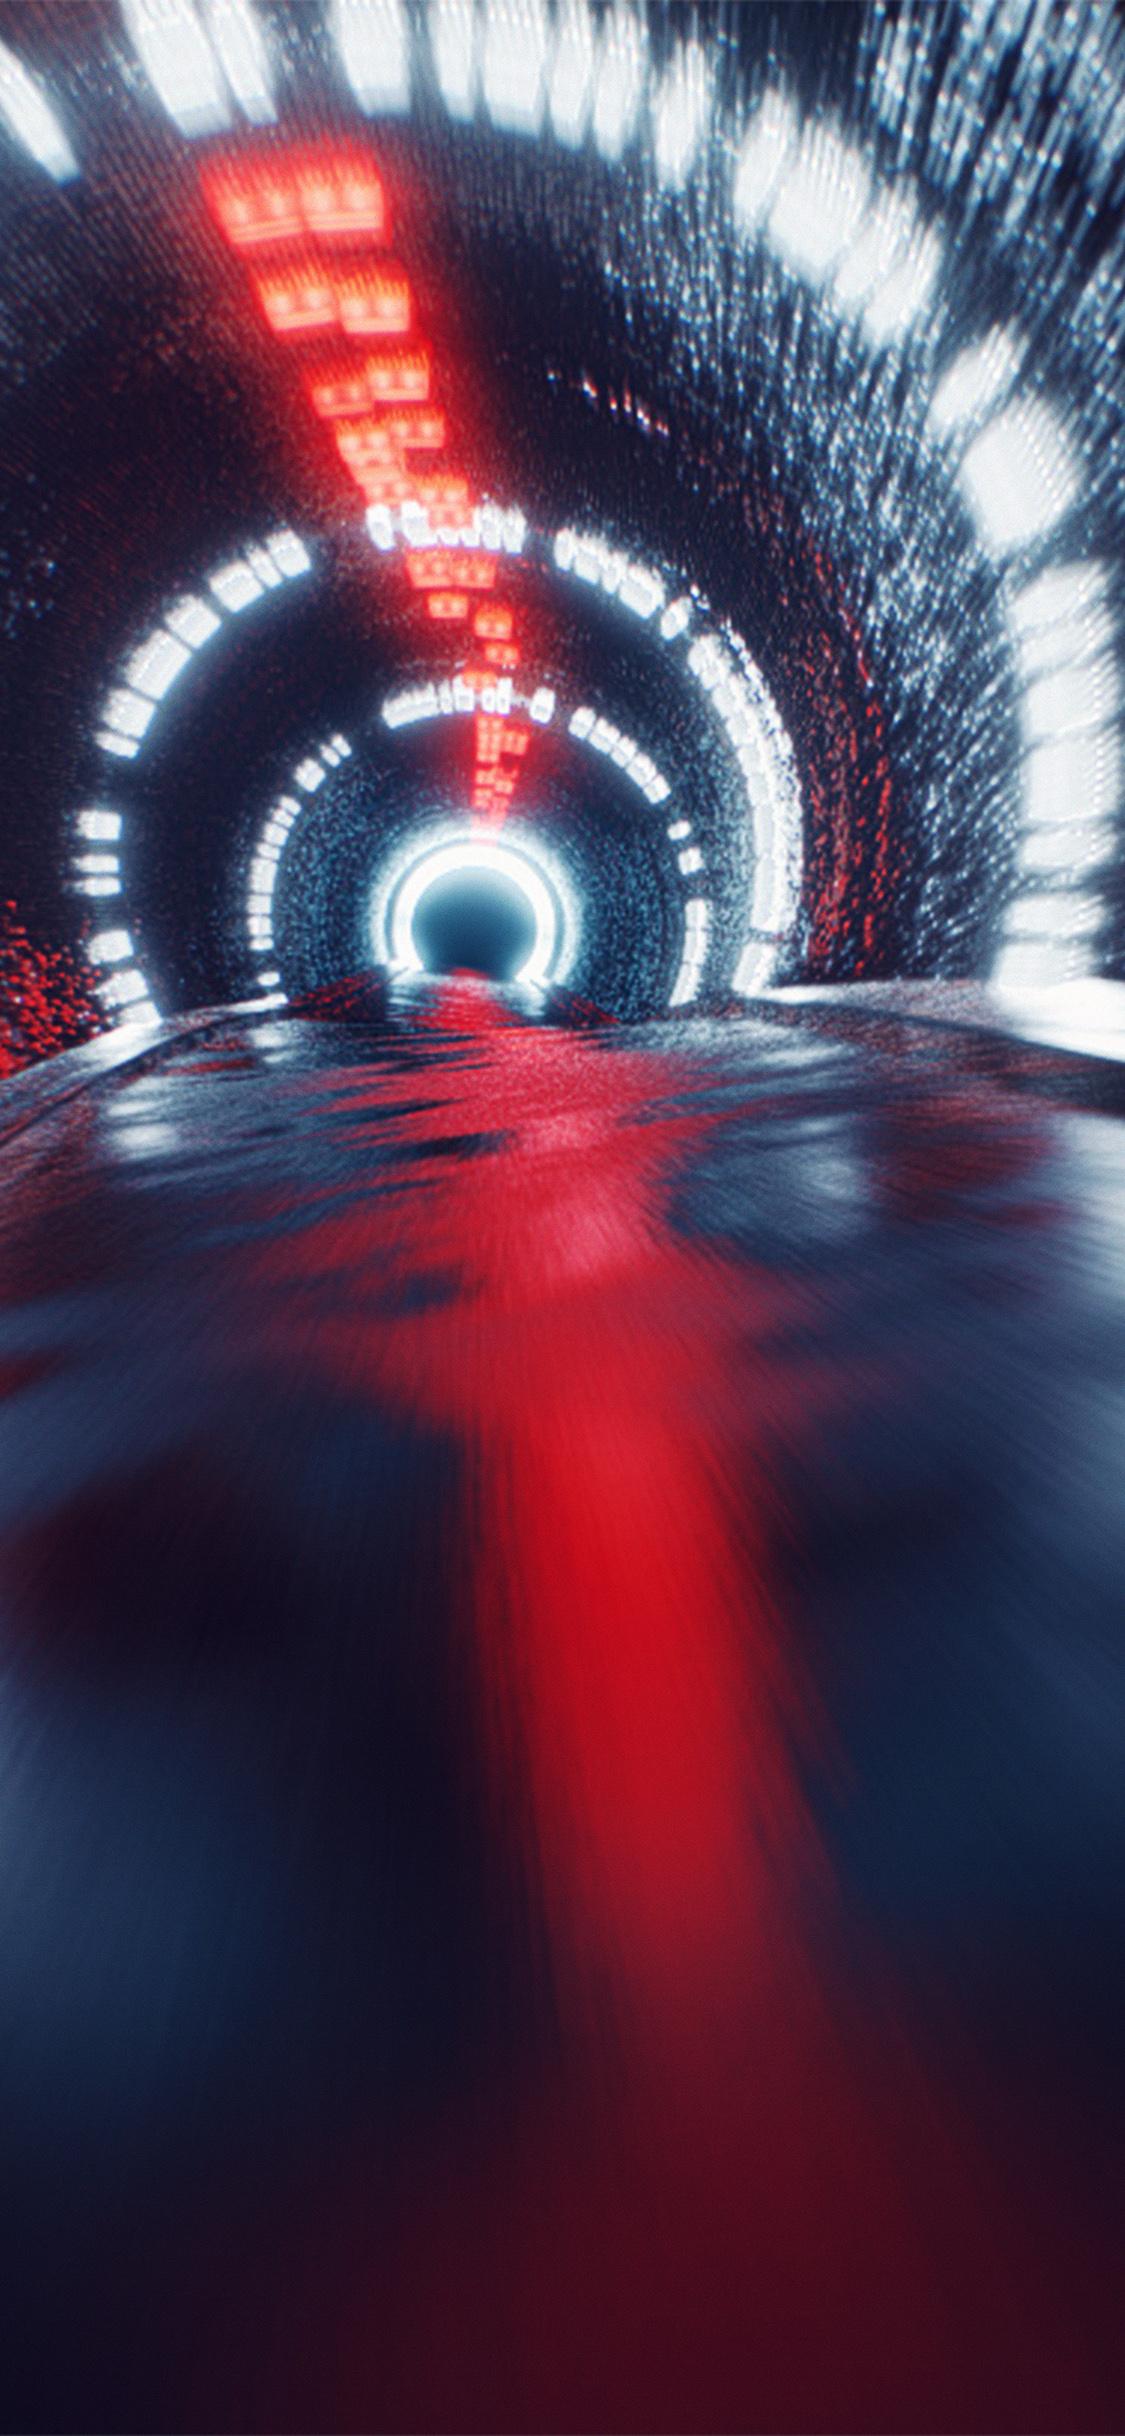 Iphonexpapers Com Iphone X Wallpaper Vv70 Tunnel Car Dark Blue